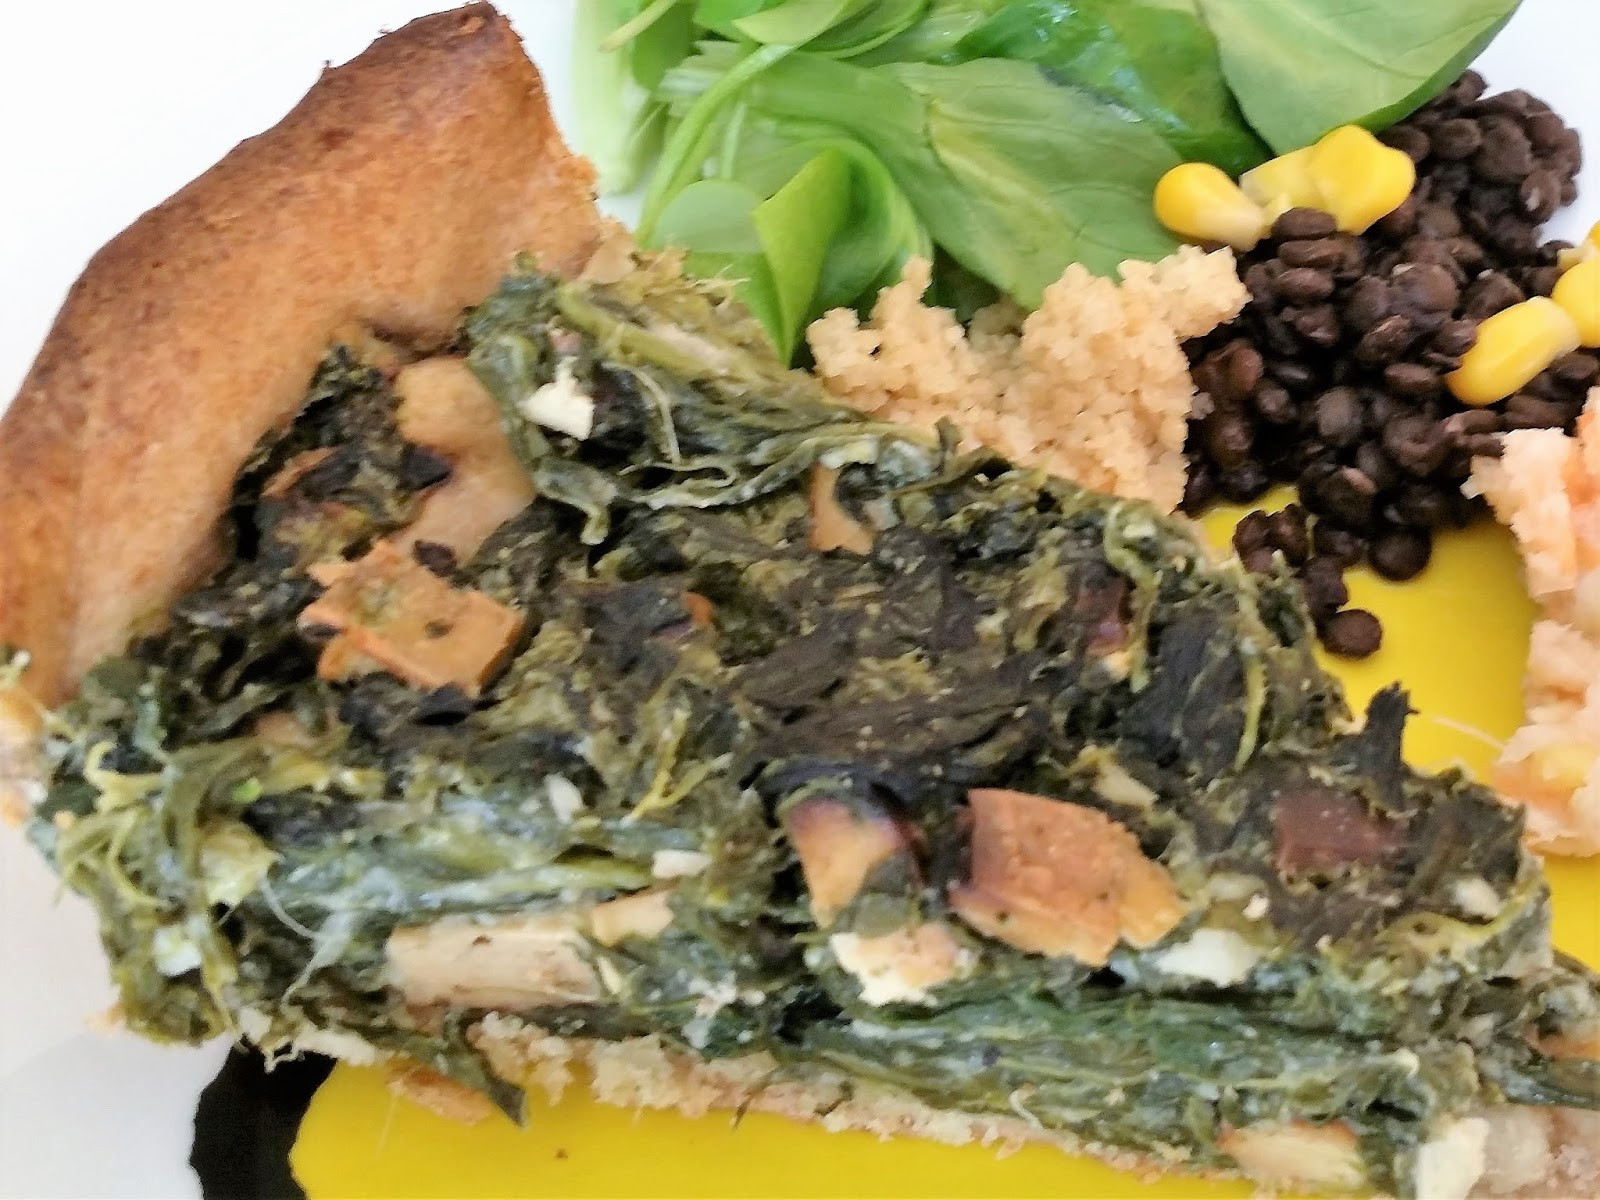 janine's vegane küche: spinat-wähe vegan